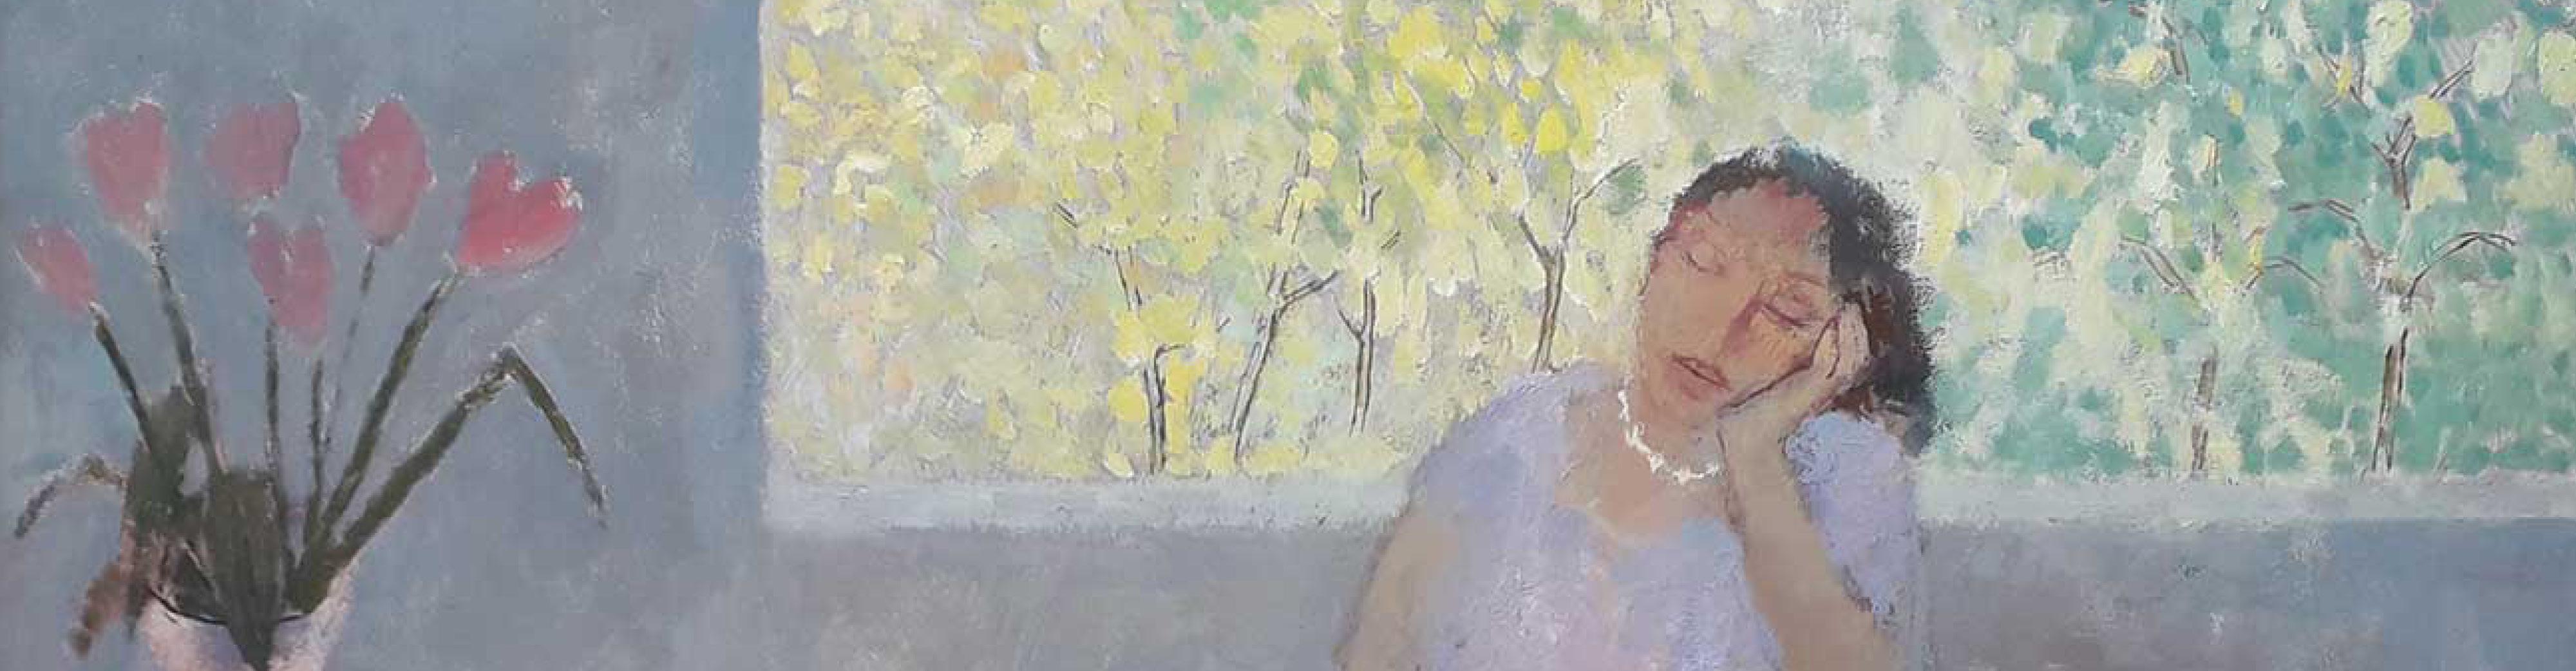 Sorrell Window banner.jpg